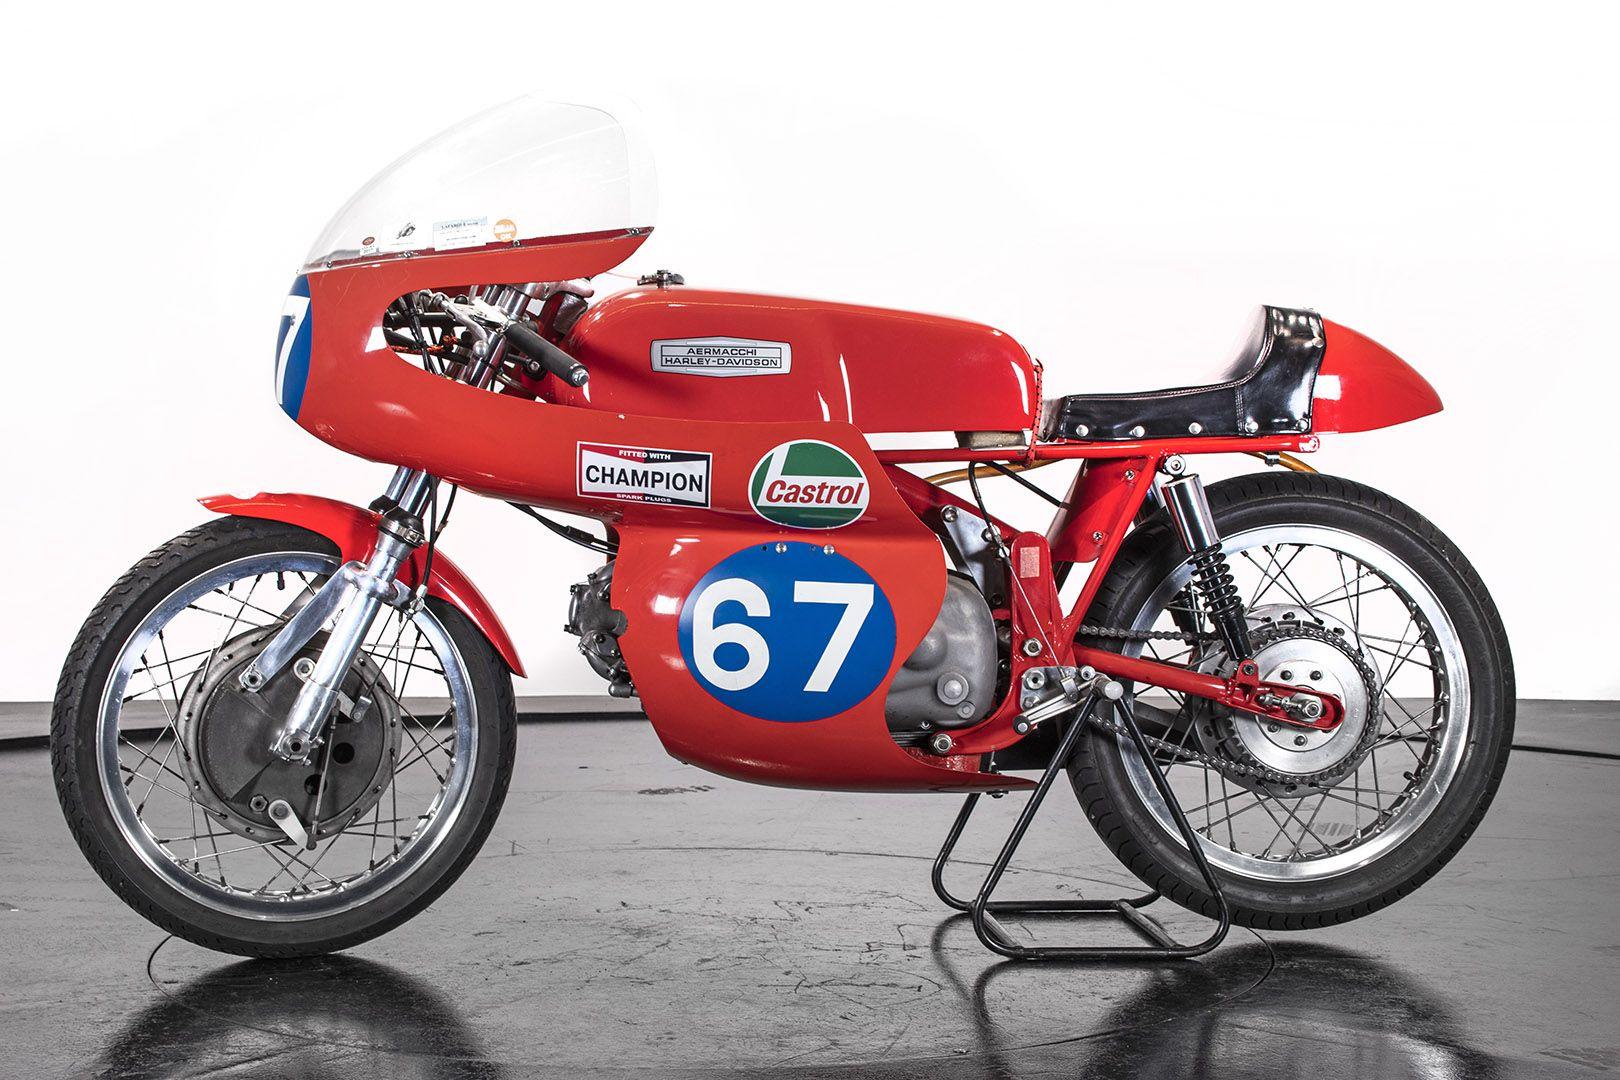 1969 Aermacchi Harley-Davidson 350 Ala d'oro 61113